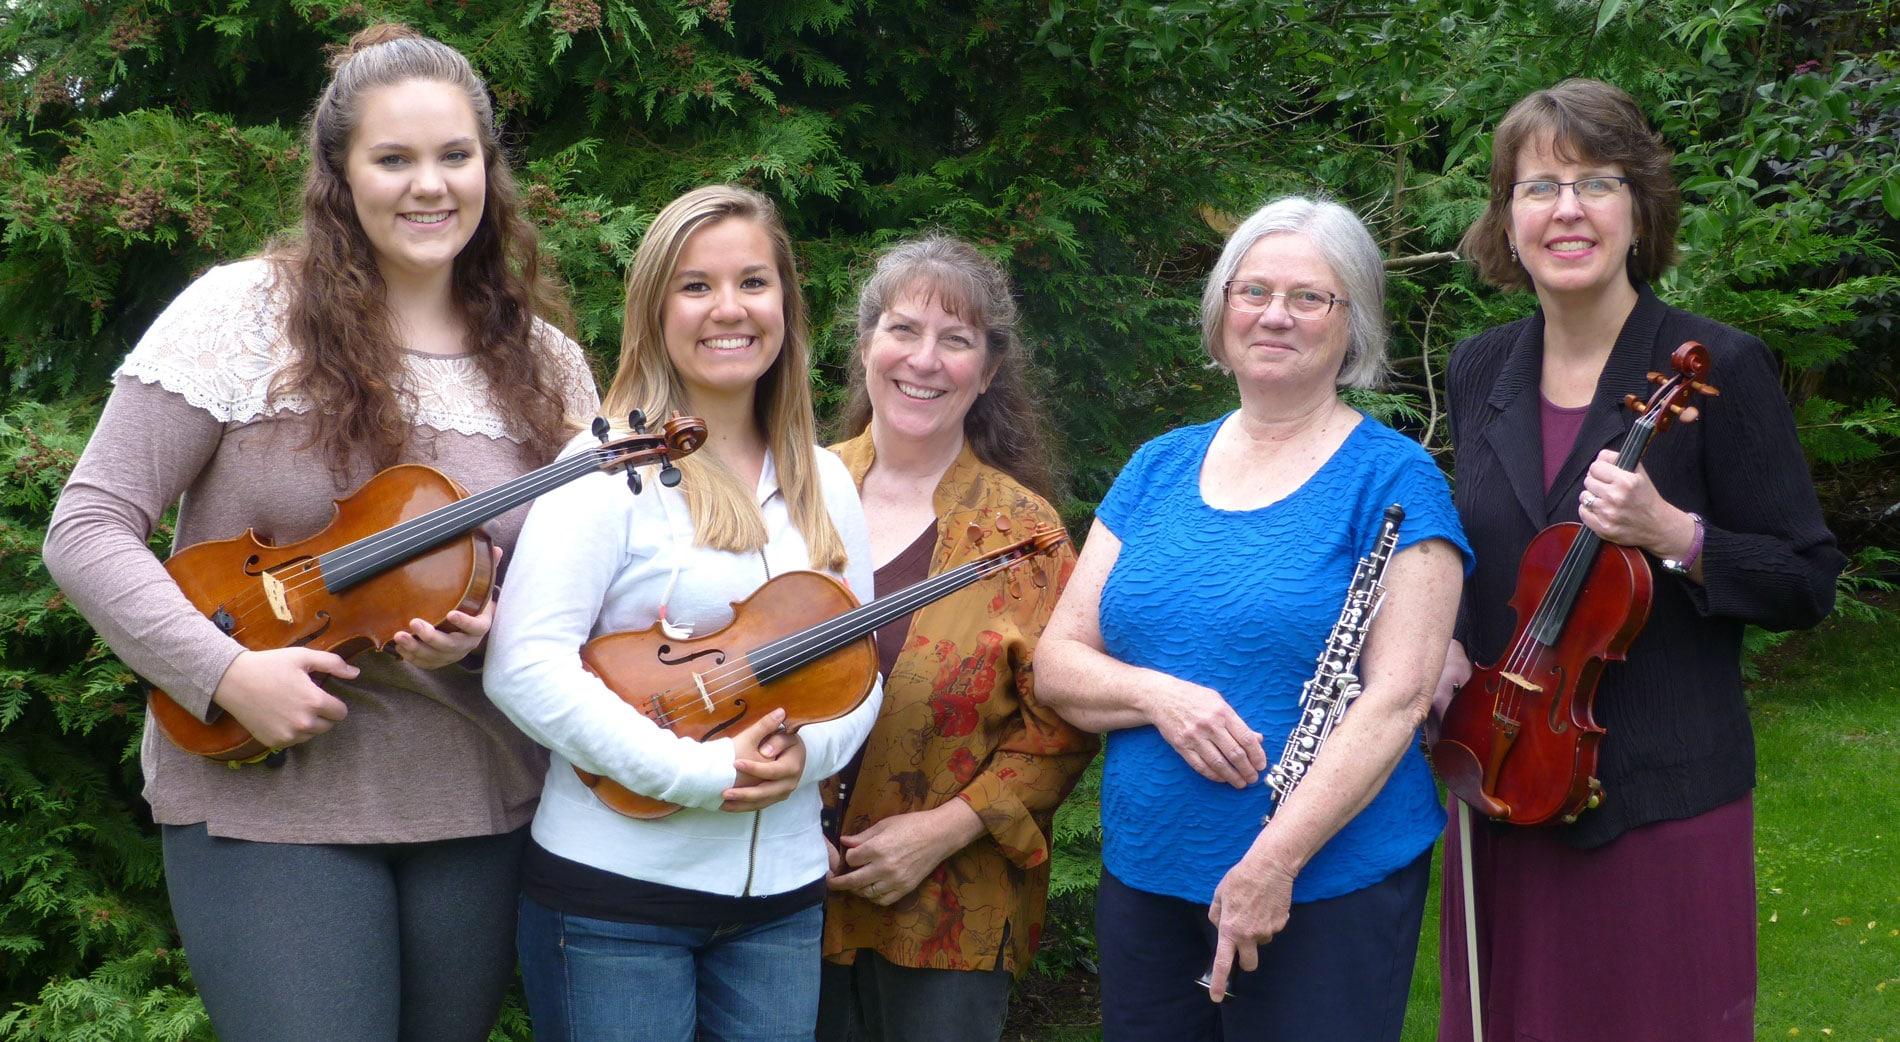 Lauren Waldron, viola; Jasmine Gauthun, violin; Marlene Moore, cello; Jacyln LaRue, oboe; Wendy Clark-Getzin, violin